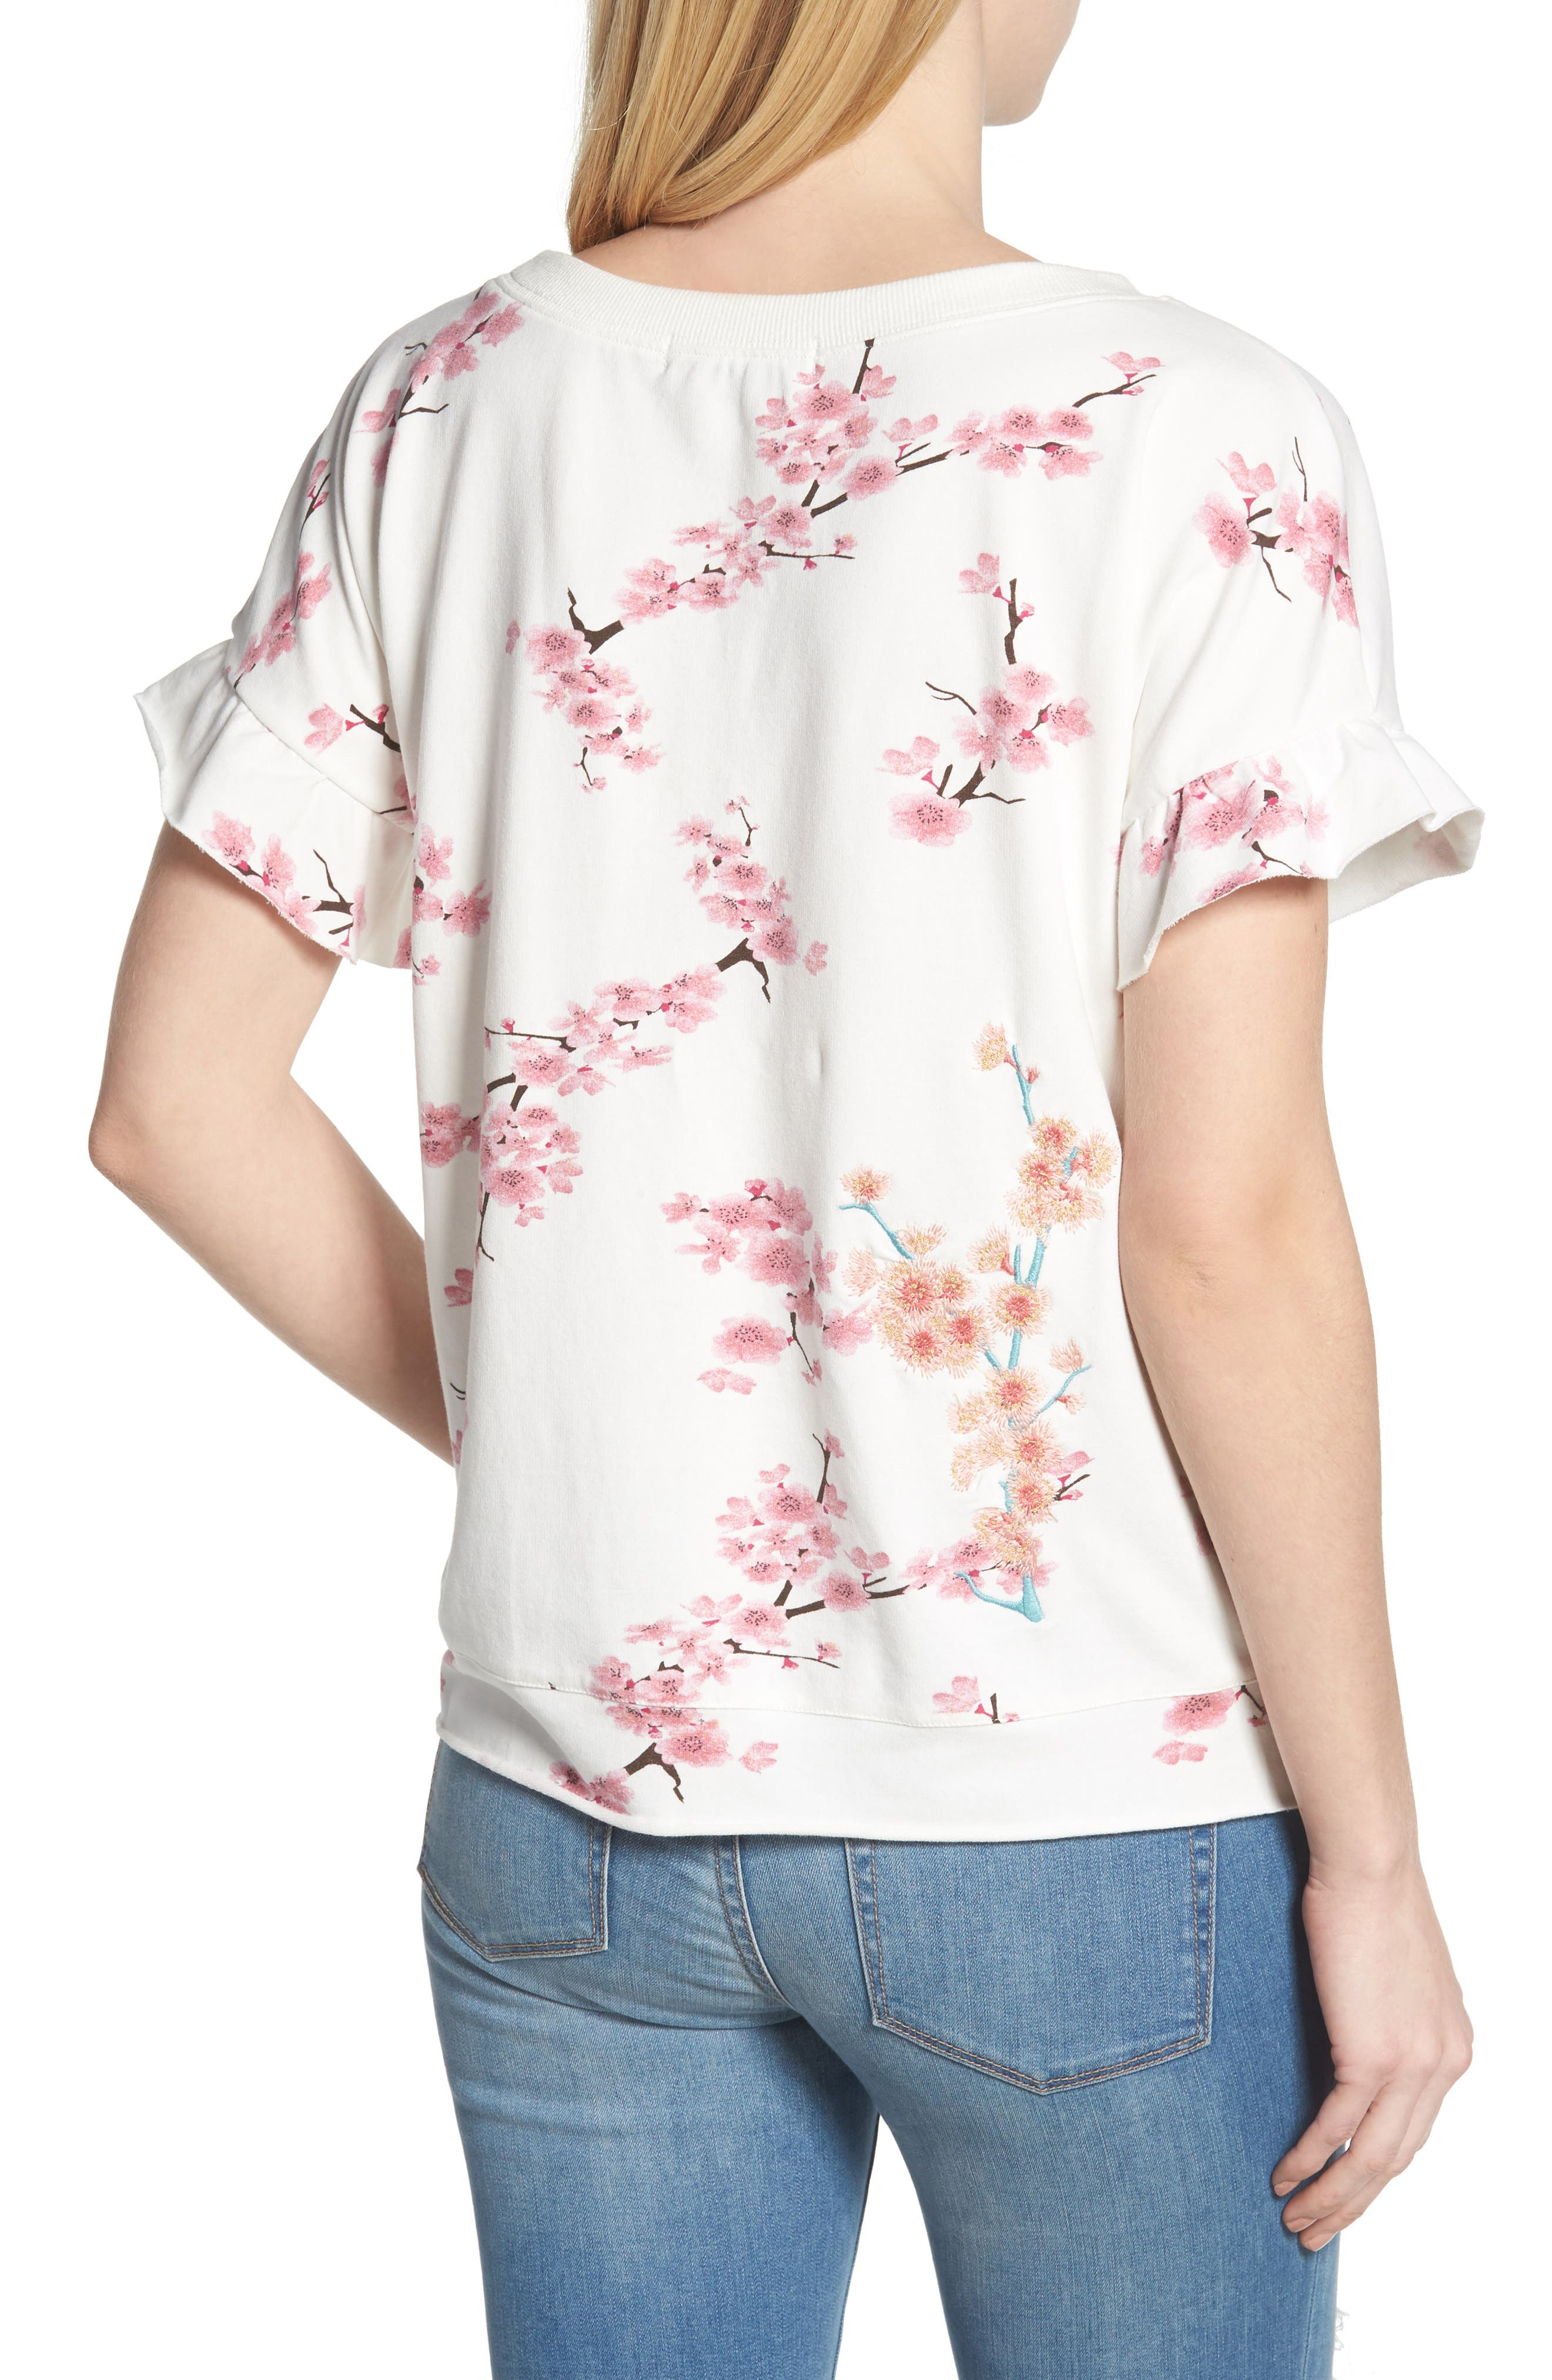 Short Sleeve Lace Up Cherry Blossom Sweatshirt,                             Alternate thumbnail 2, color,                             White Cherry Blossom